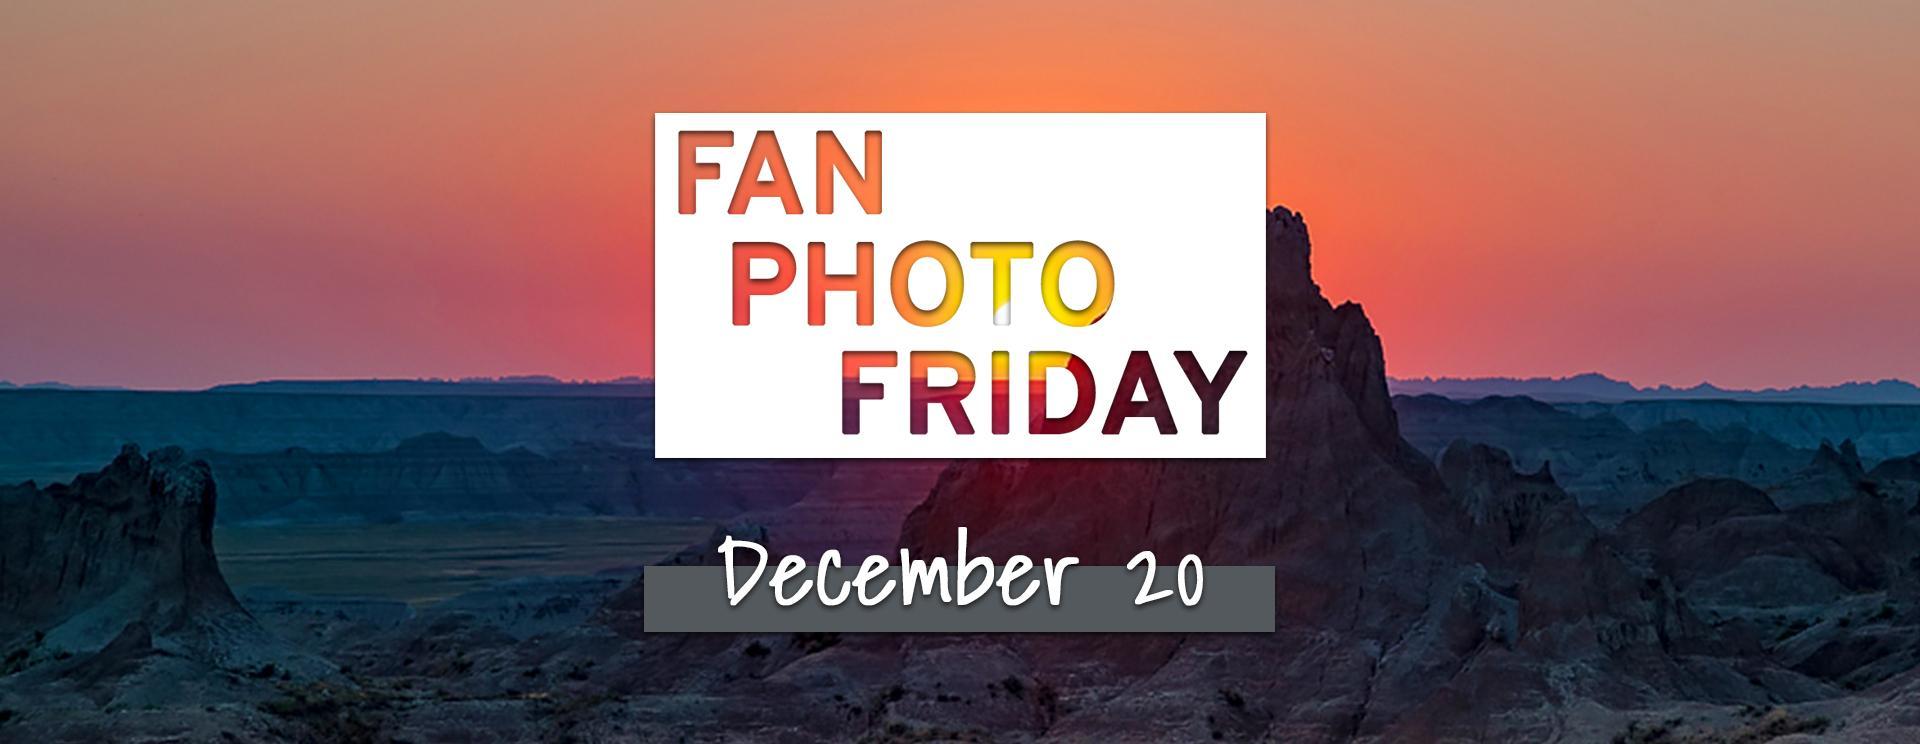 Fan Photo Friday | Dec. 20, 2019